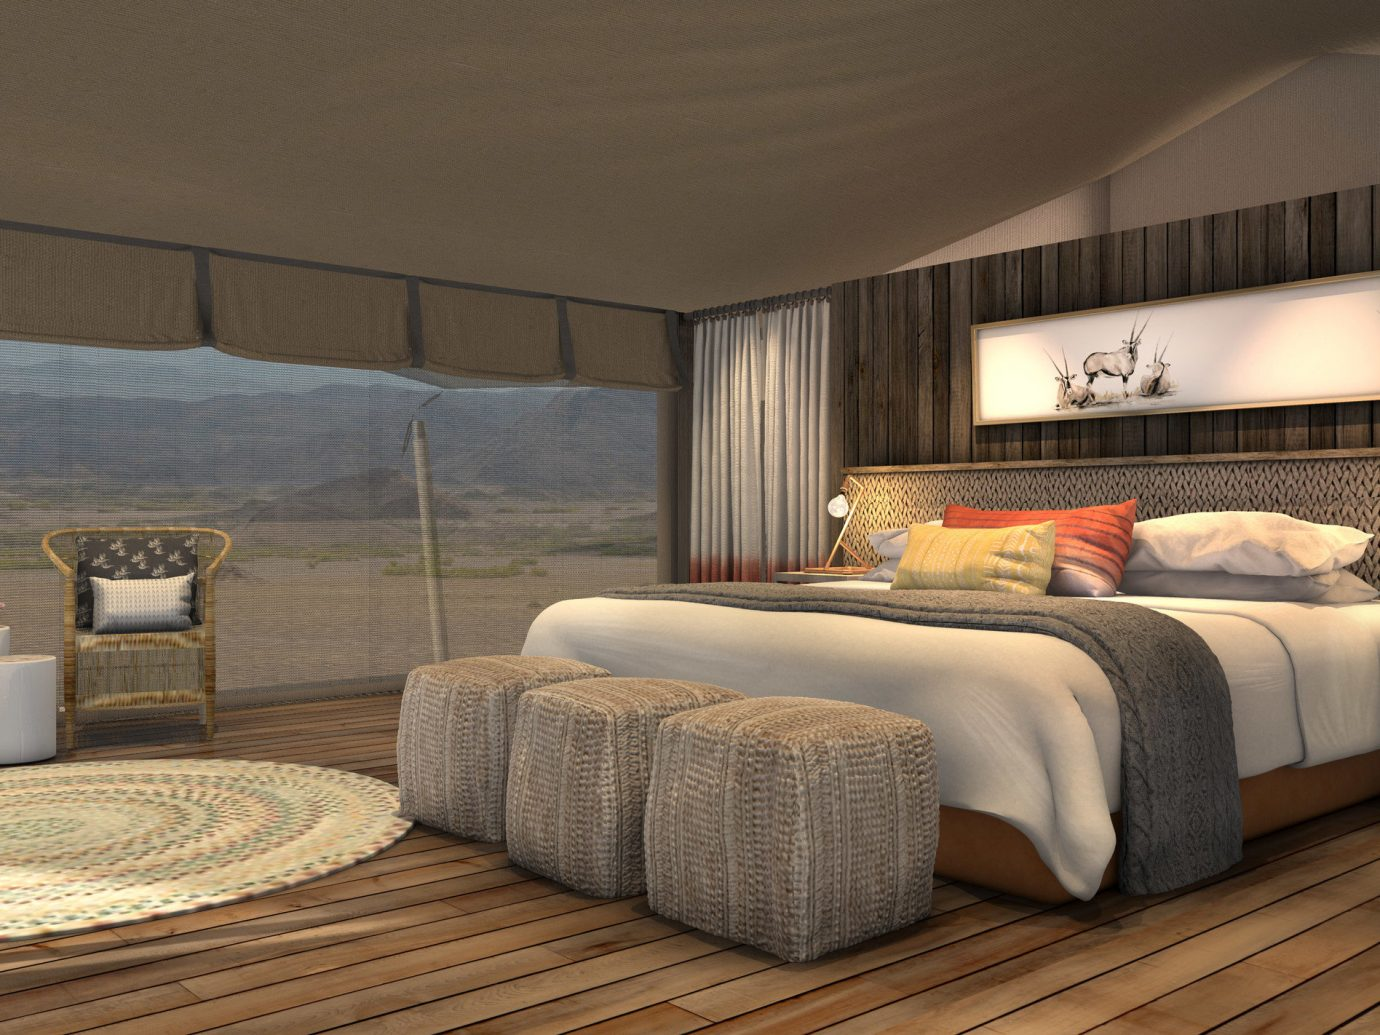 africa Honeymoon Namibia Romance Trip Ideas indoor wall room ceiling interior design bed bed frame Bedroom Suite hotel interior designer furniture window area decorated